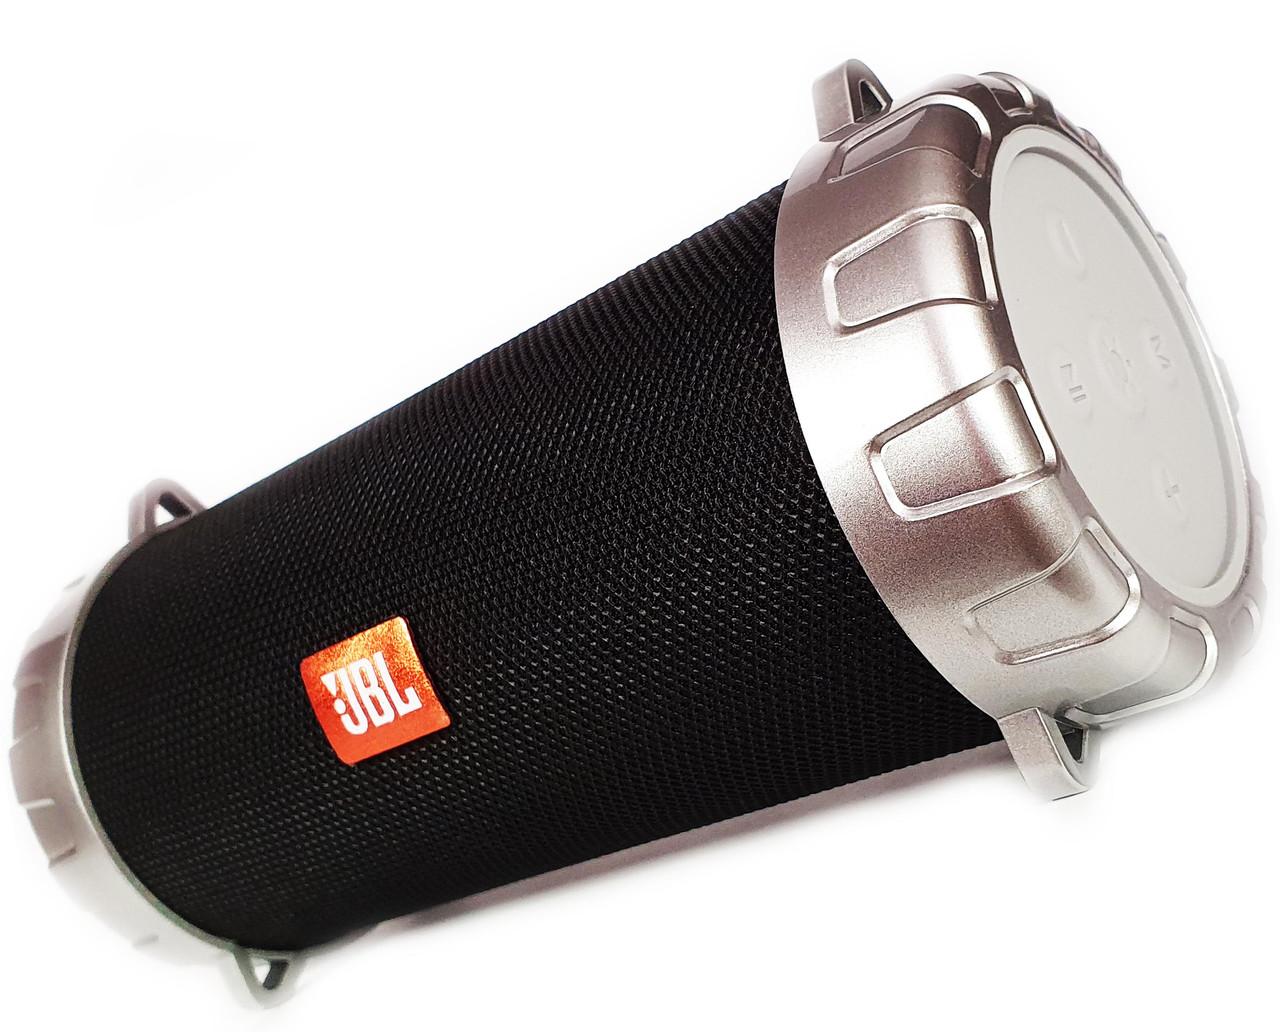 MEGA BASS Bazuka JBL S07 Bluetooth стерео колонка с цветомузыкой USB, MicroSD